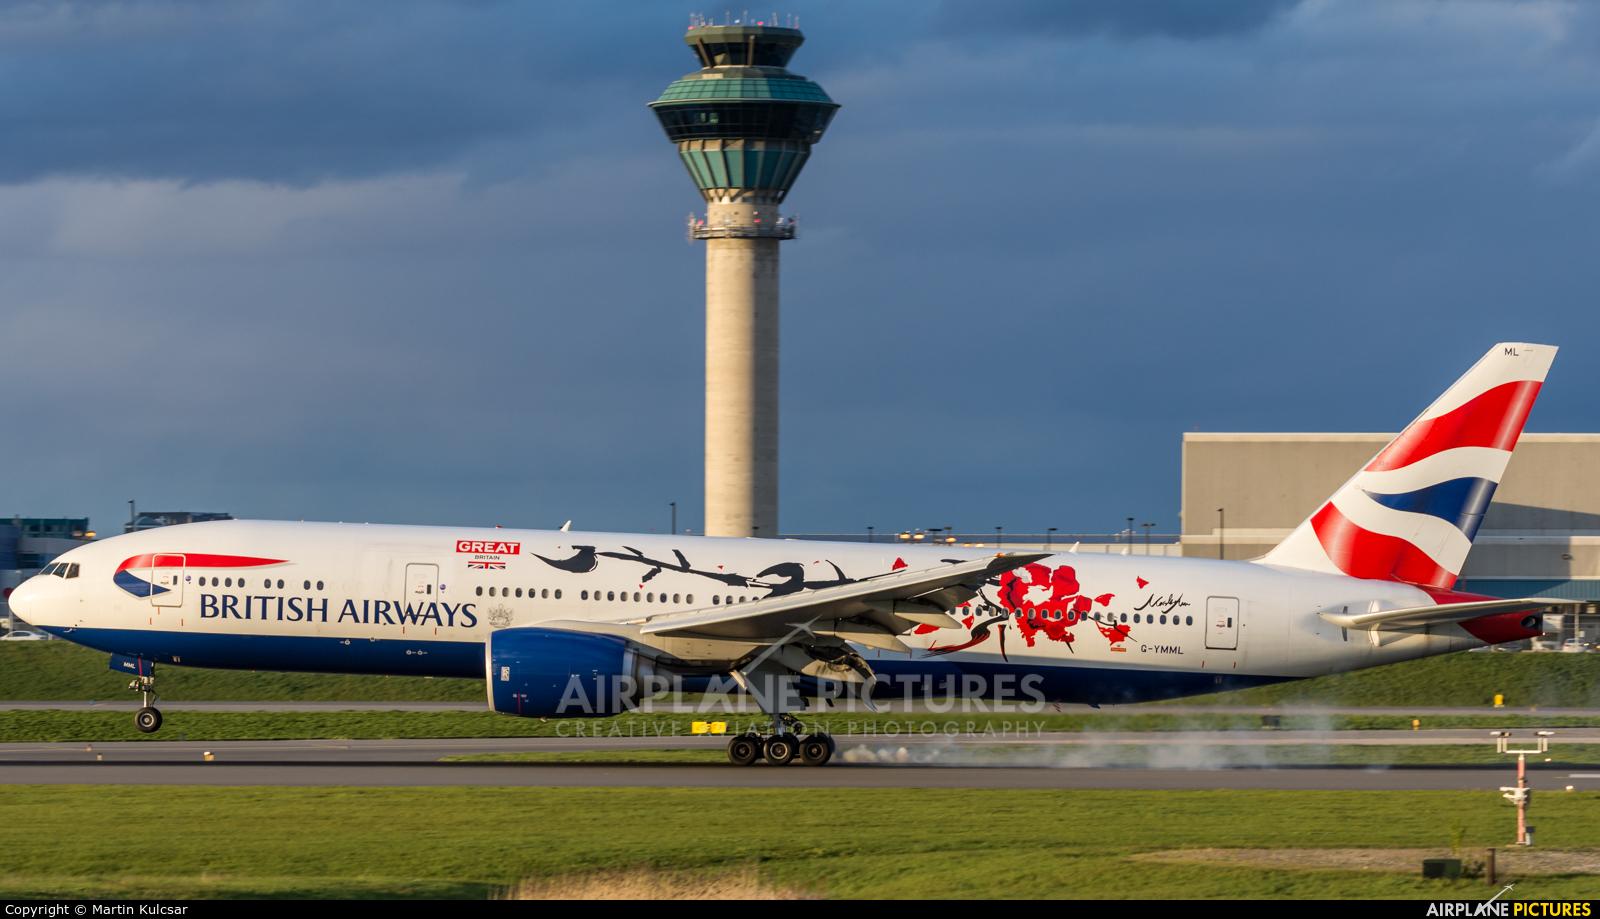 British Airways G-YMML aircraft at Toronto - Pearson Intl, ON